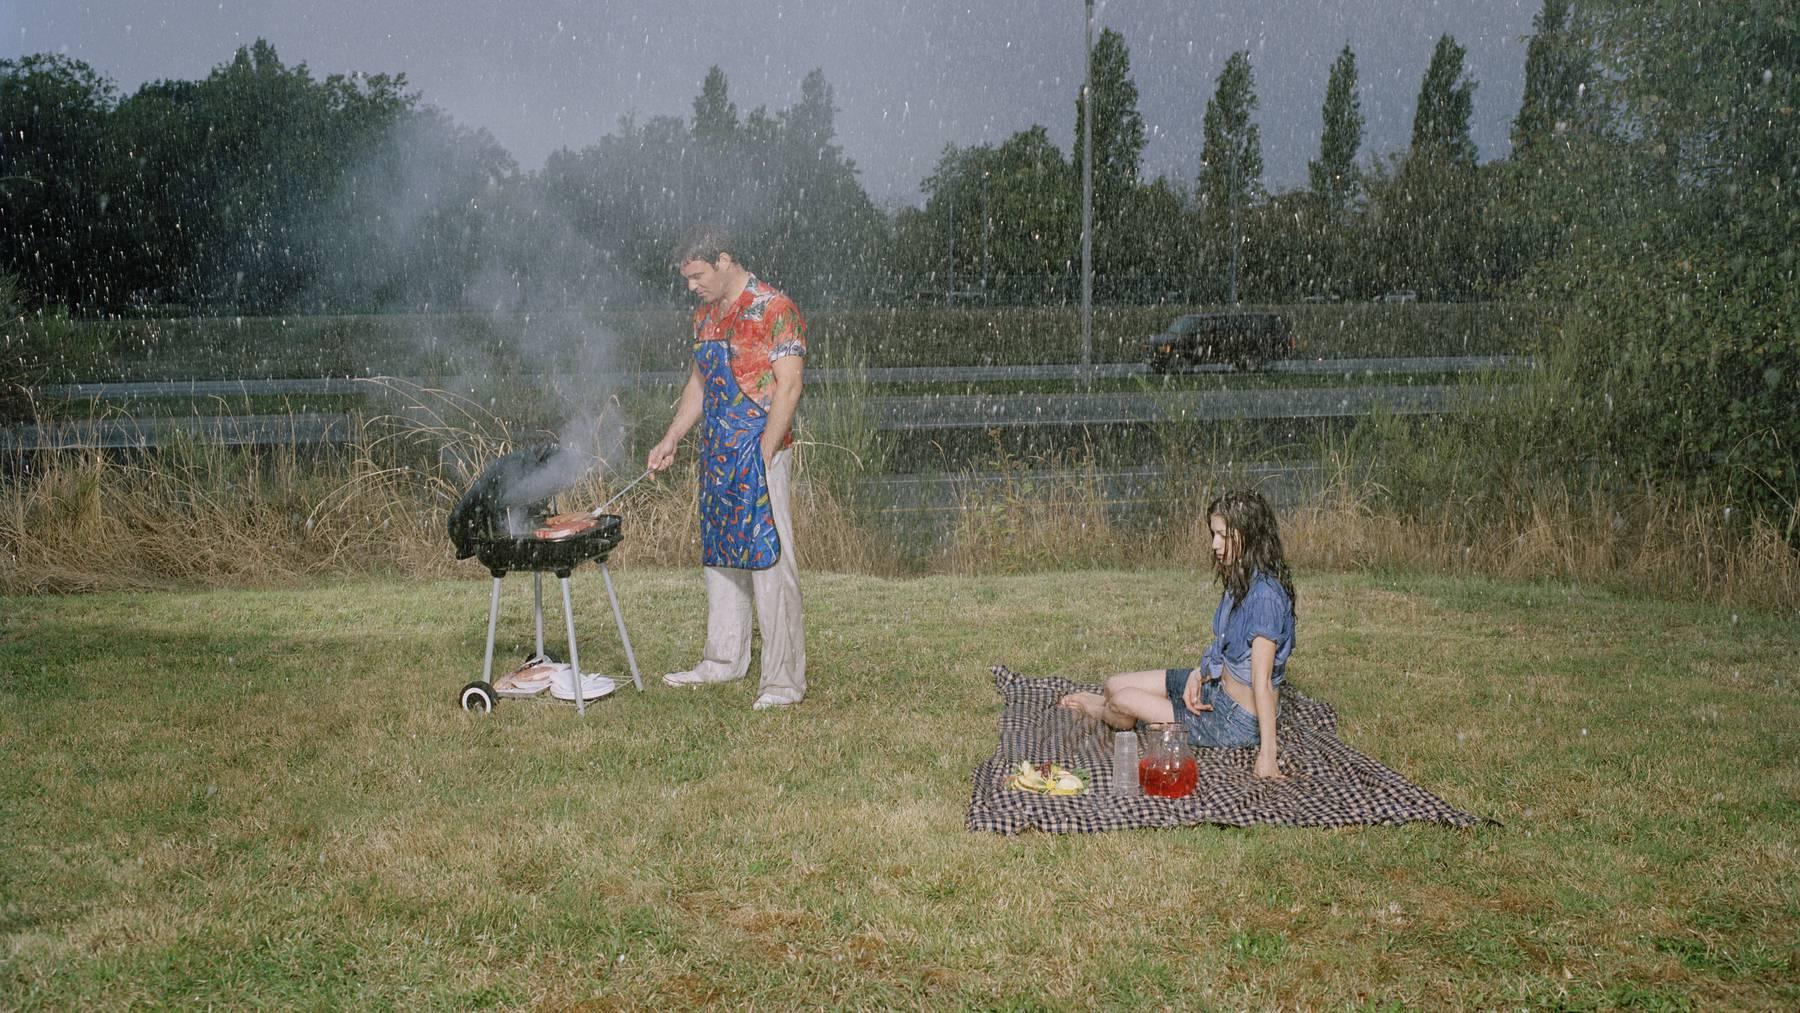 GettyImages-200486670-001 Grillieren